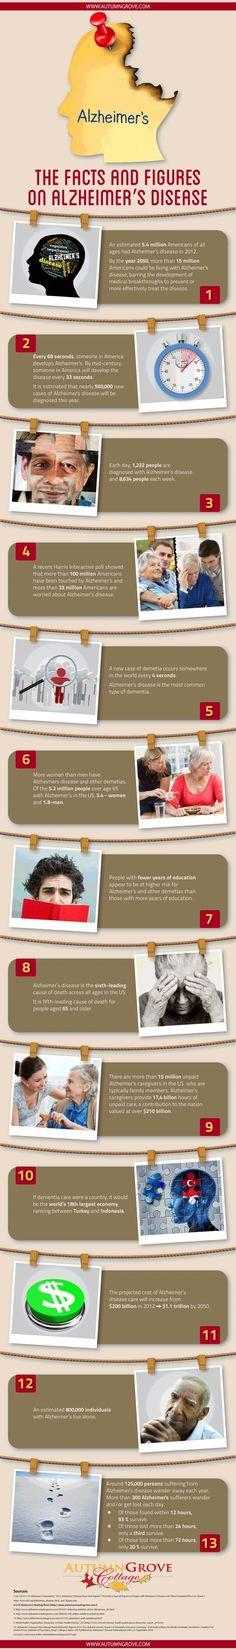 Alzheimer& and Dementia facts. Alzheimer Care, Dementia Care, Alzheimer's And Dementia, Dementia Facts, Dementia Training, Alzheimer's Walk, Doctor Of Nursing Practice, Alzheimers Awareness, Brain Health